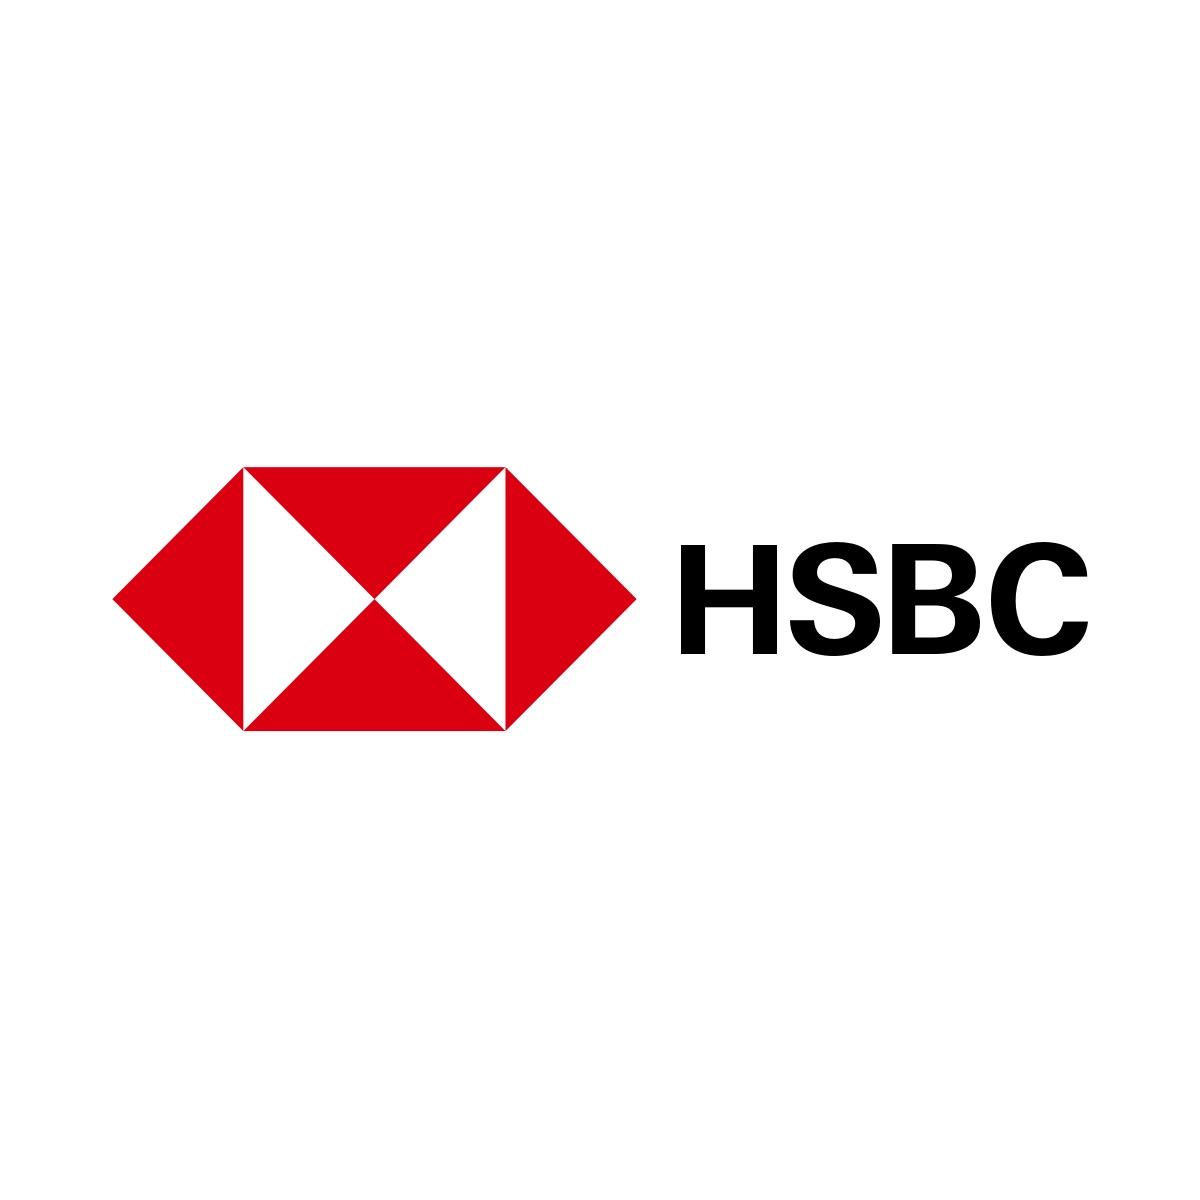 Hsbc bank forex rates malaysia mmm2021 mmgp forex